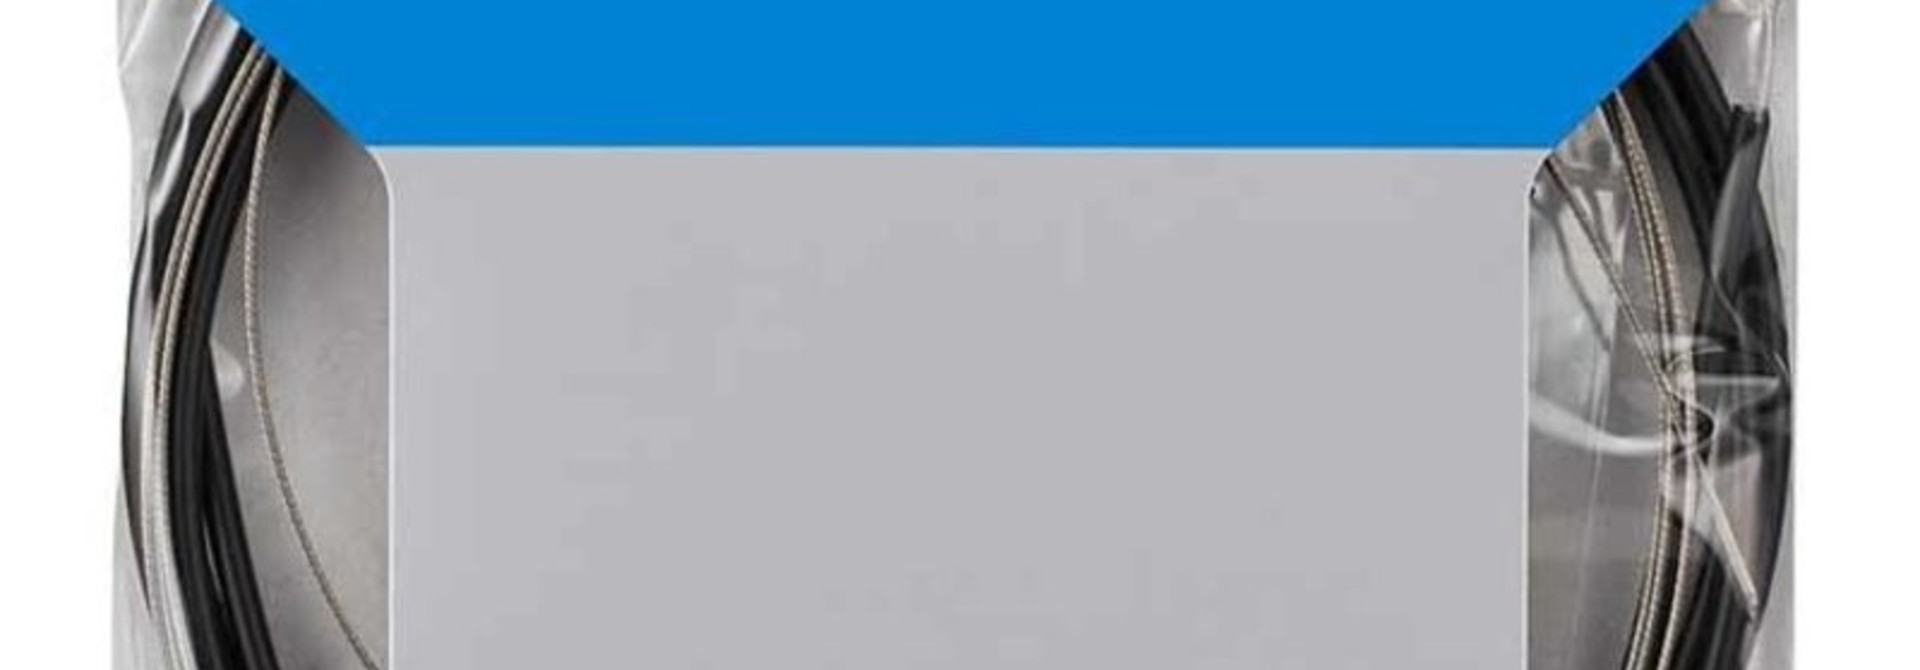 Shimano, MTB 1x Shift Cable Set, Stainless Steel, 2000mm, Black, Shimano/SRAM, Set